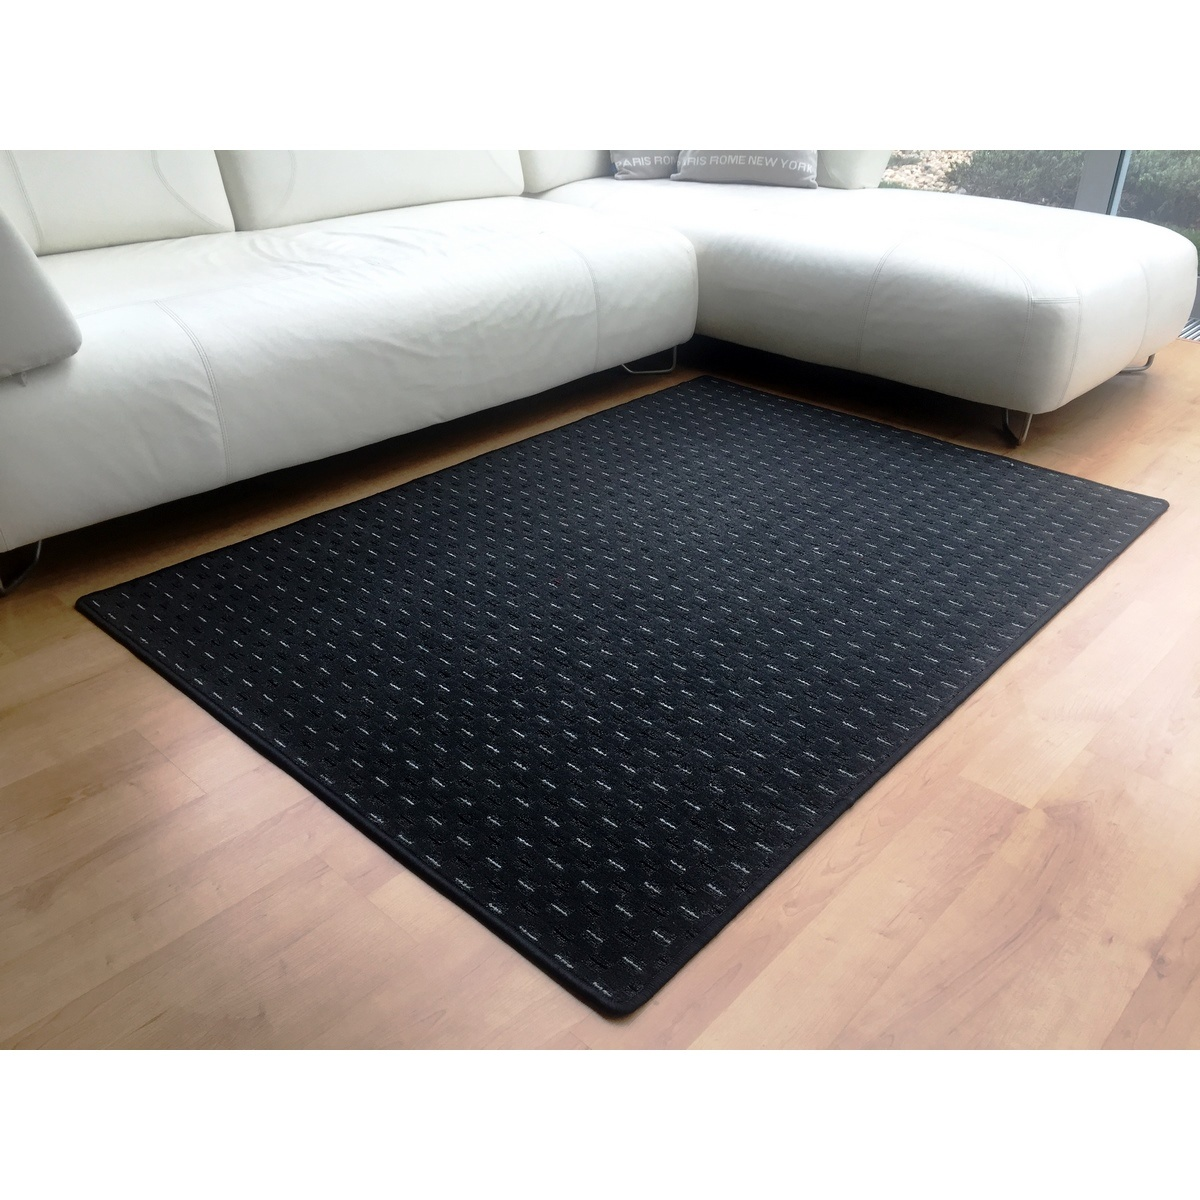 Vopi Kusový koberec Valencia antracit, 140 x 200 cm